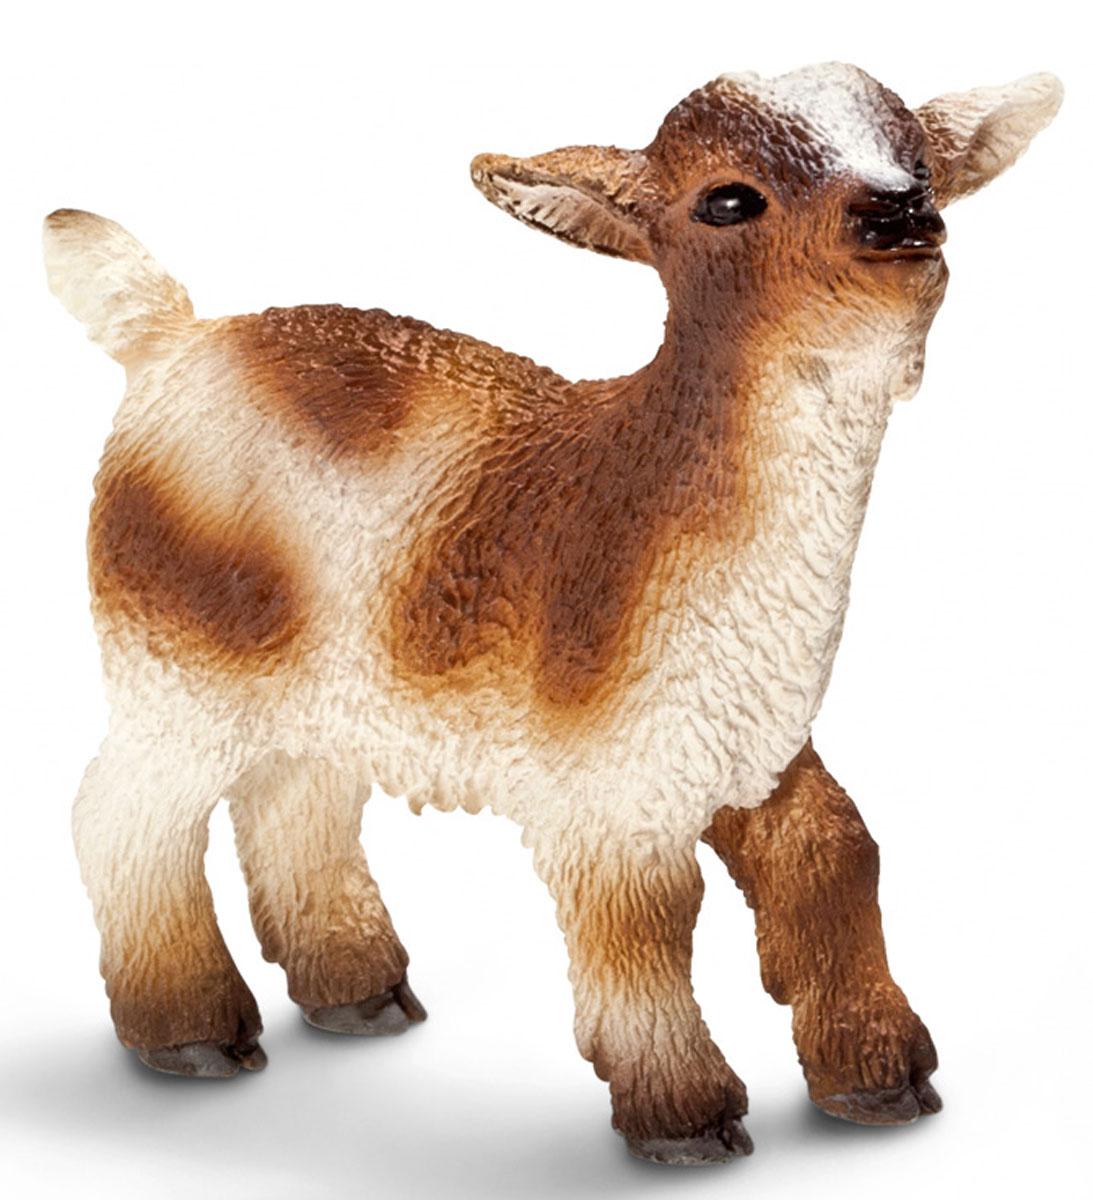 Картинка коза игрушка для детей на прозрачном фоне